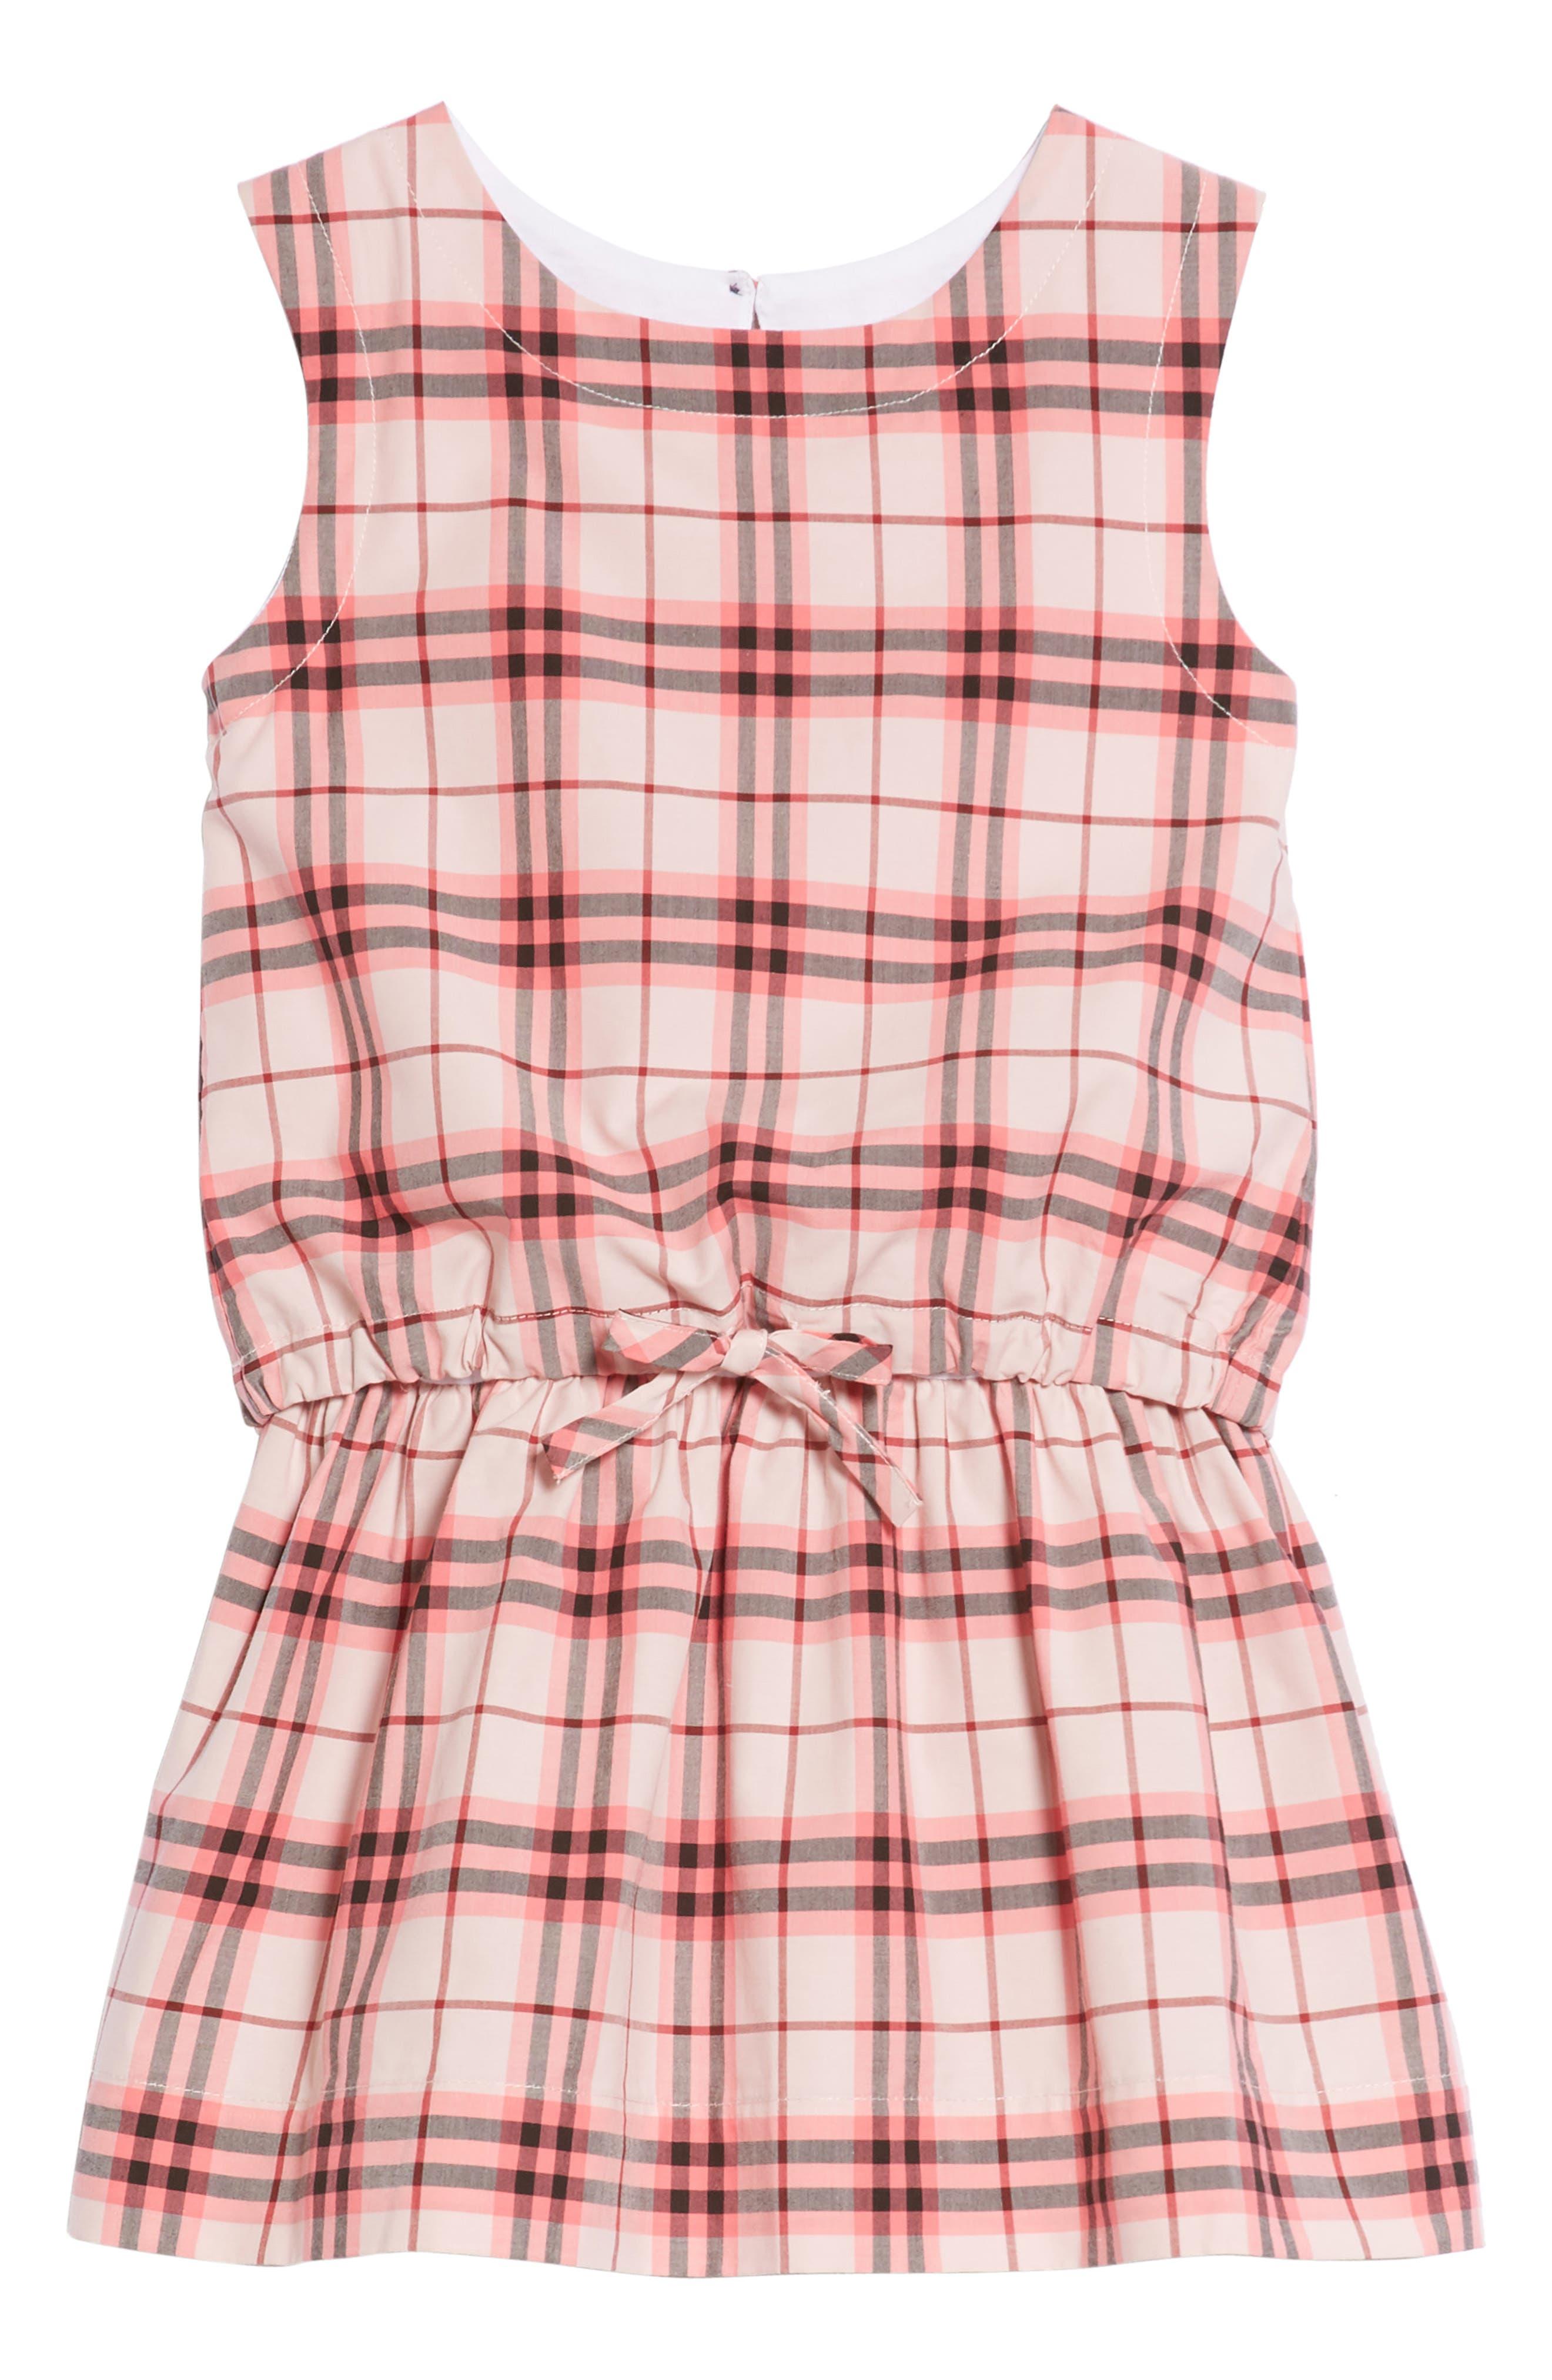 Mabel Check Dress,                         Main,                         color, Bright Rose